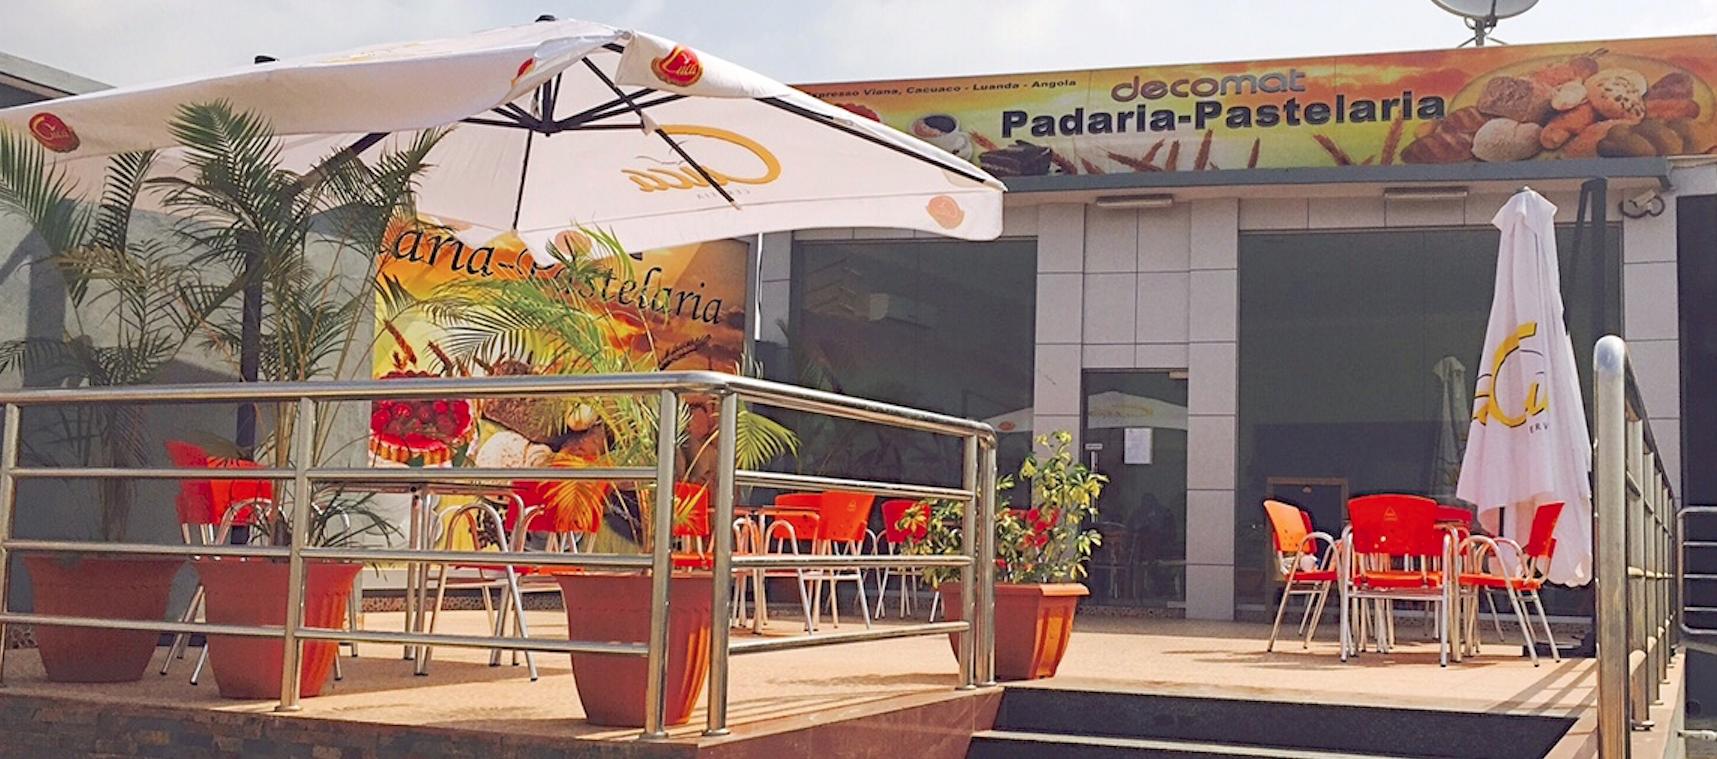 Padaria Pastelaria & Cafetaria